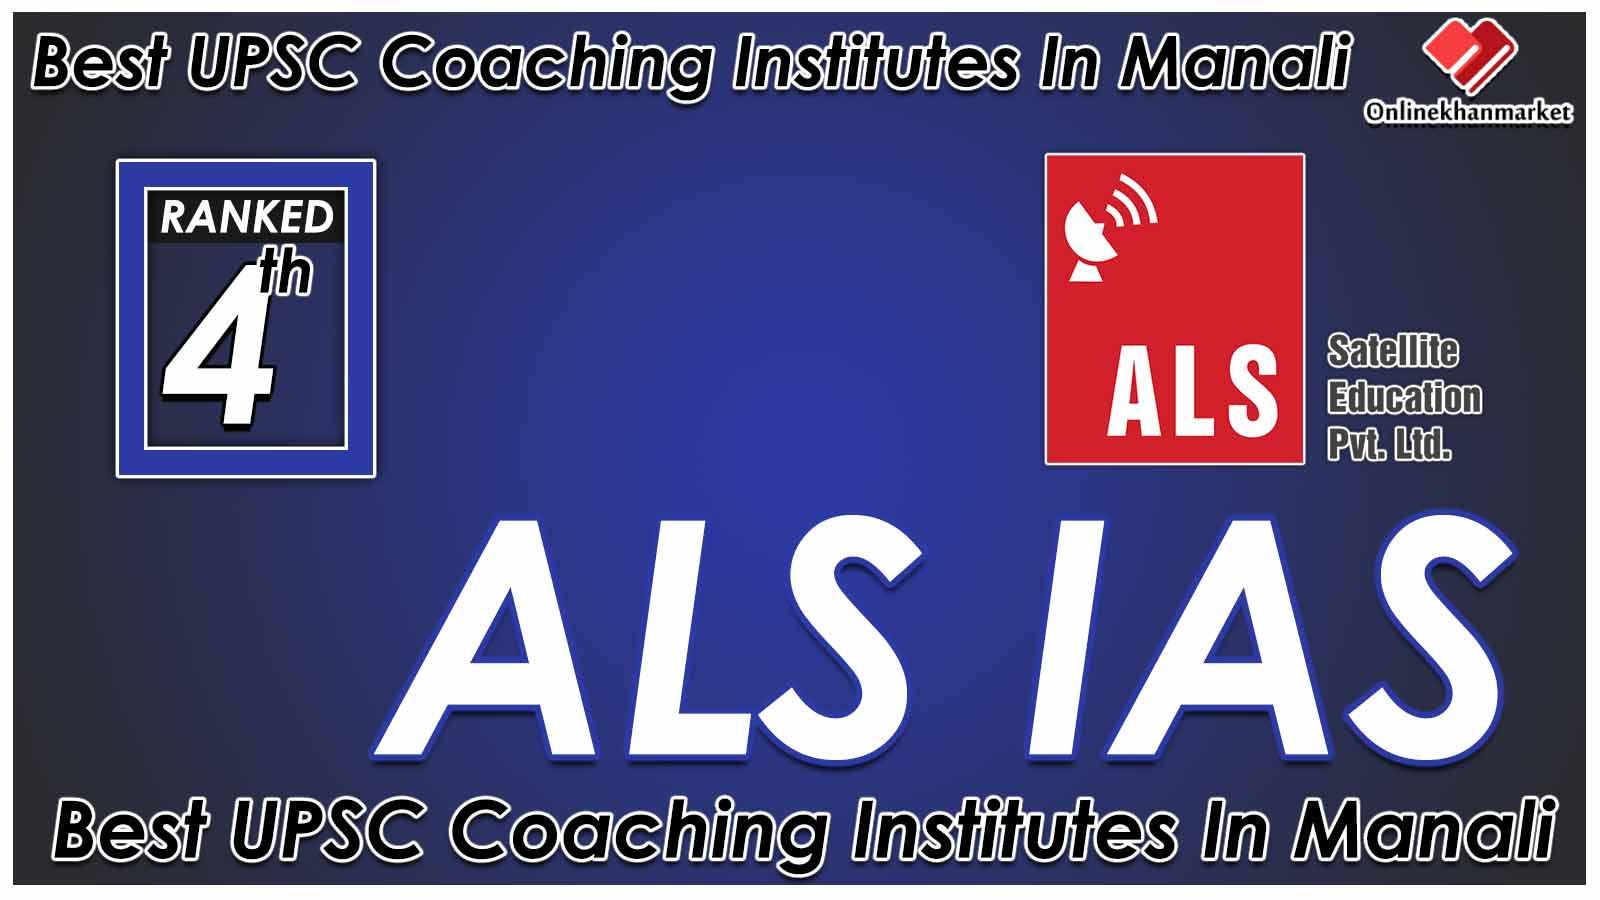 Best UPSC Coaching in Manali